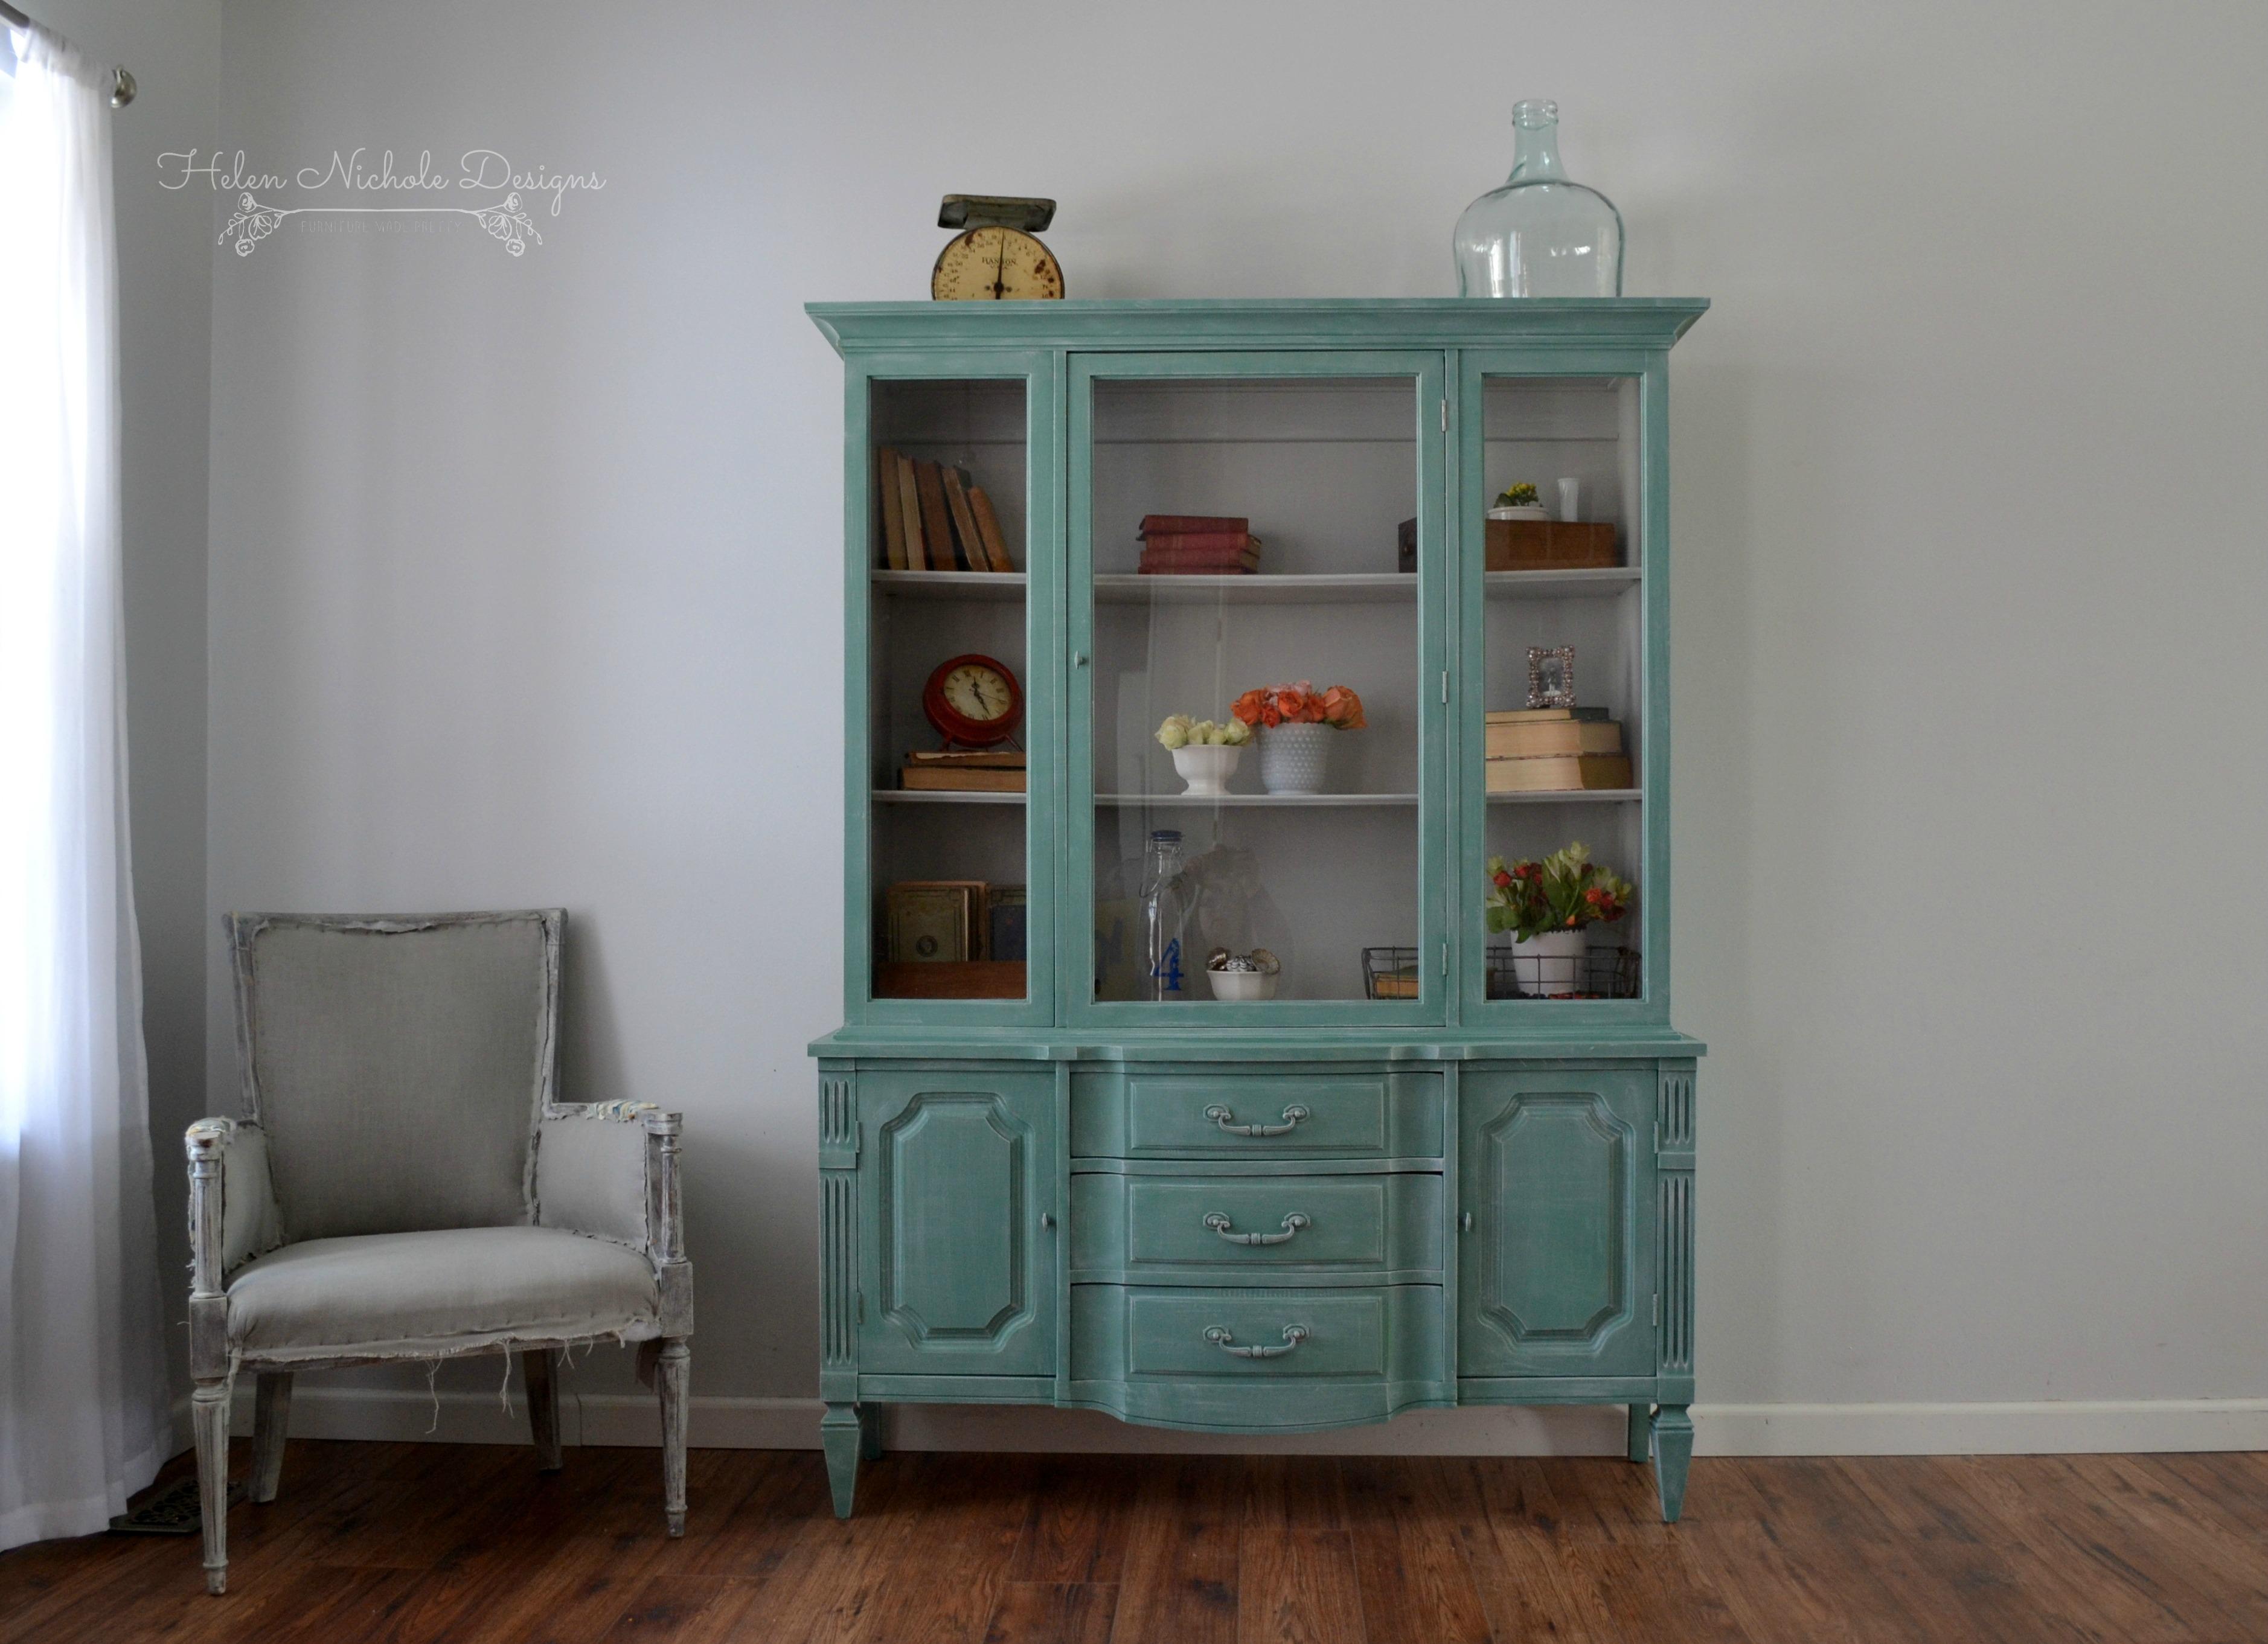 painted furniture – Helen Nichole Designs